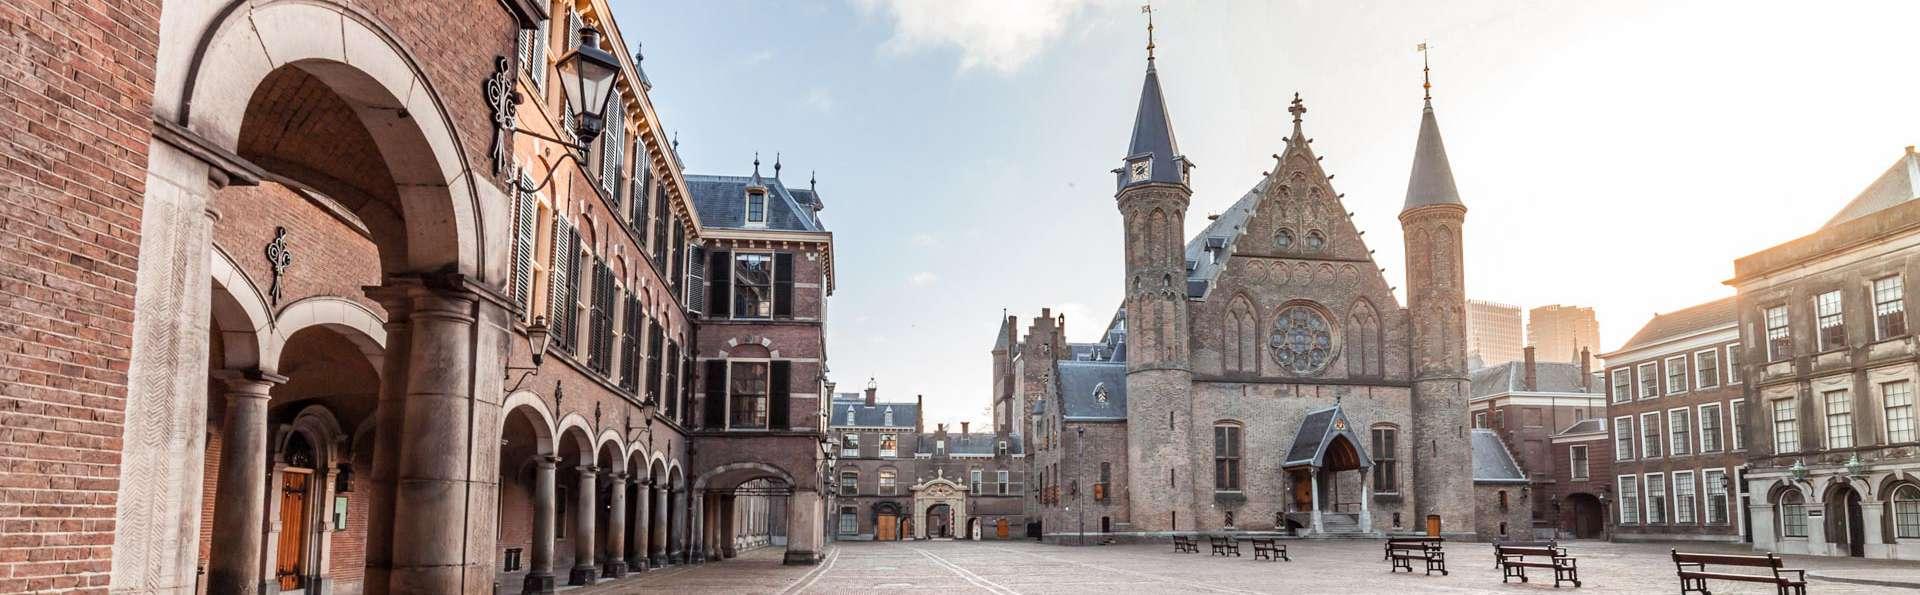 Ibis Den Haag City Centre - EDIT_DEN_HAAG_05.jpg